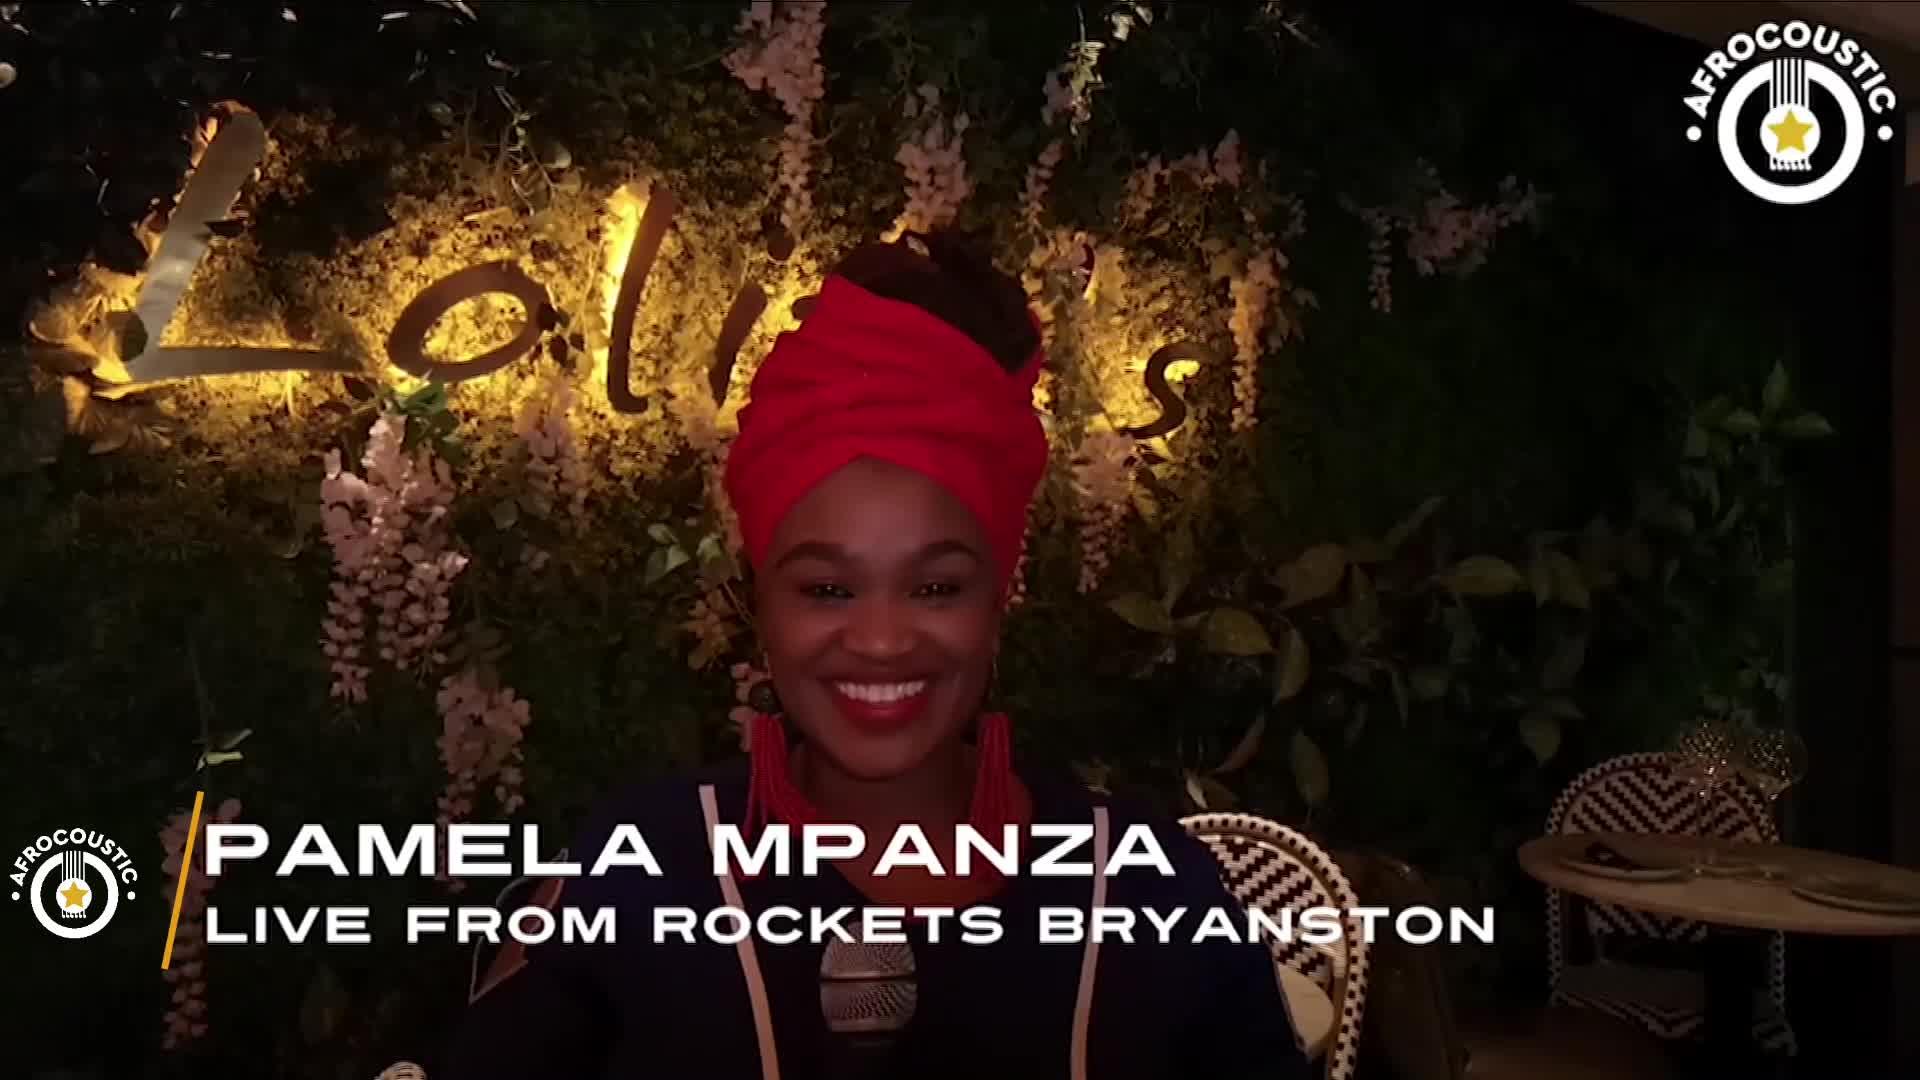 Afrocoustic Pamela Mpanza - interview